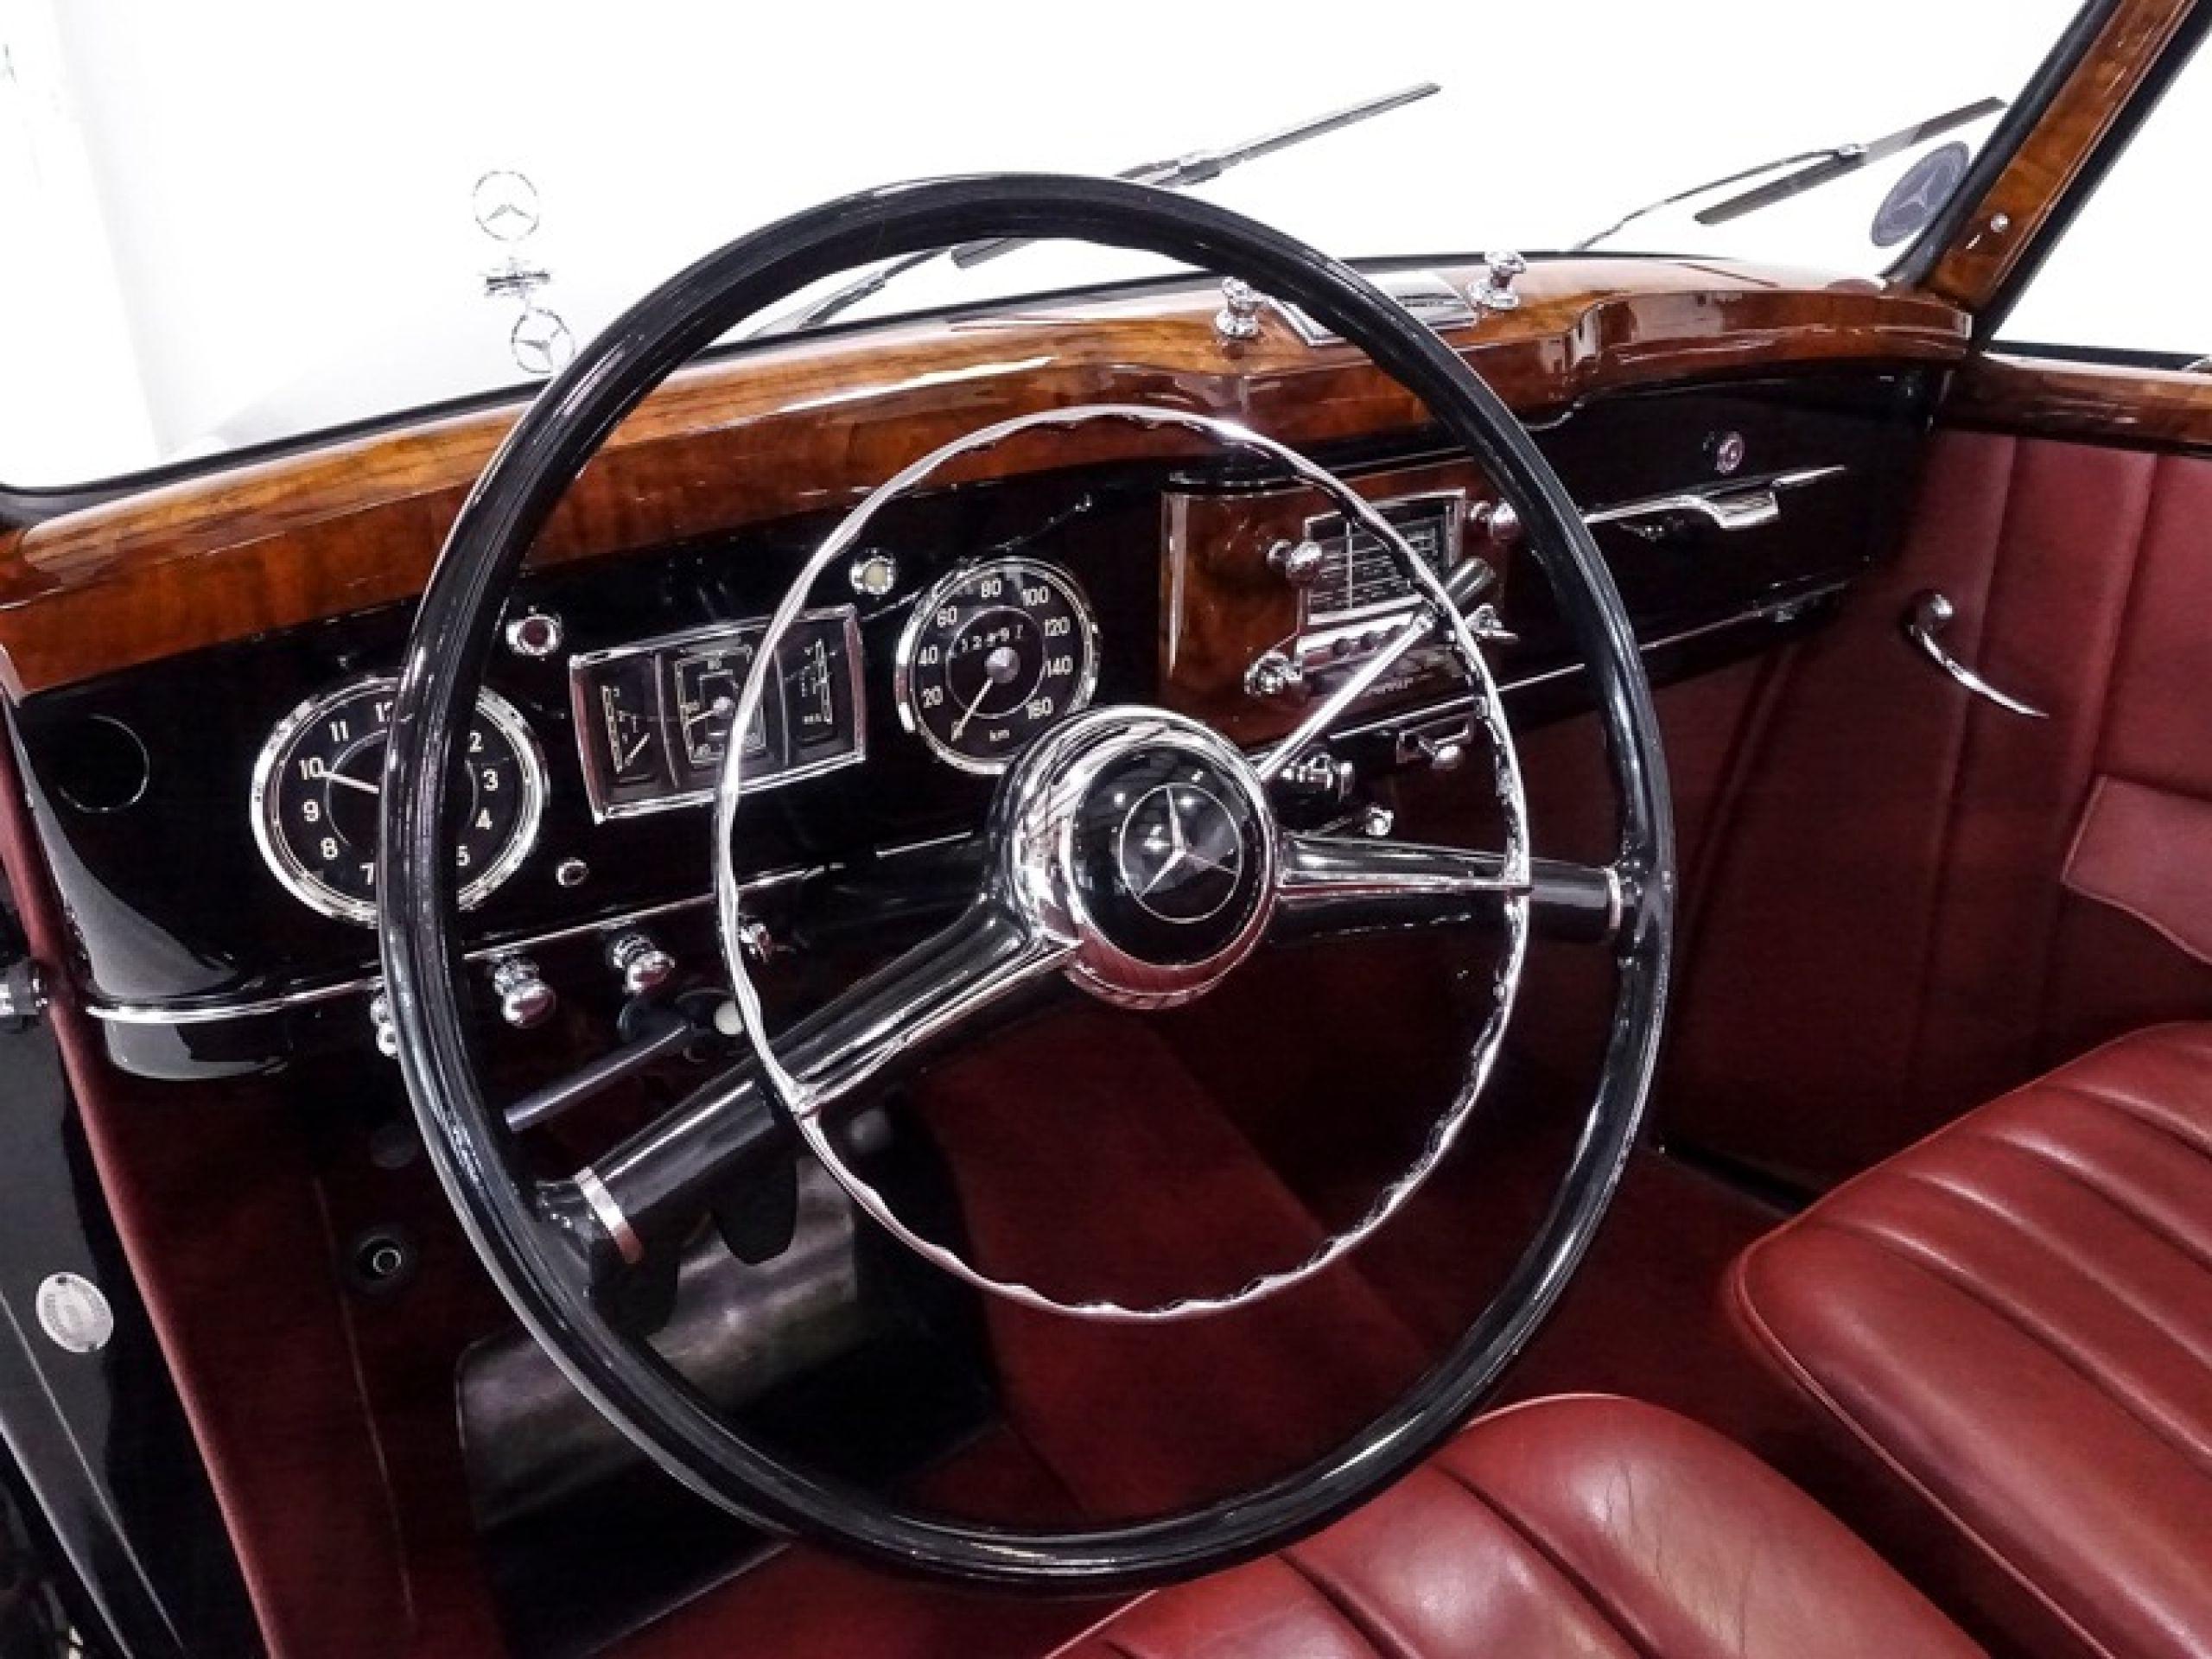 1952 Mercedes-Benz 220 Cabriolet B